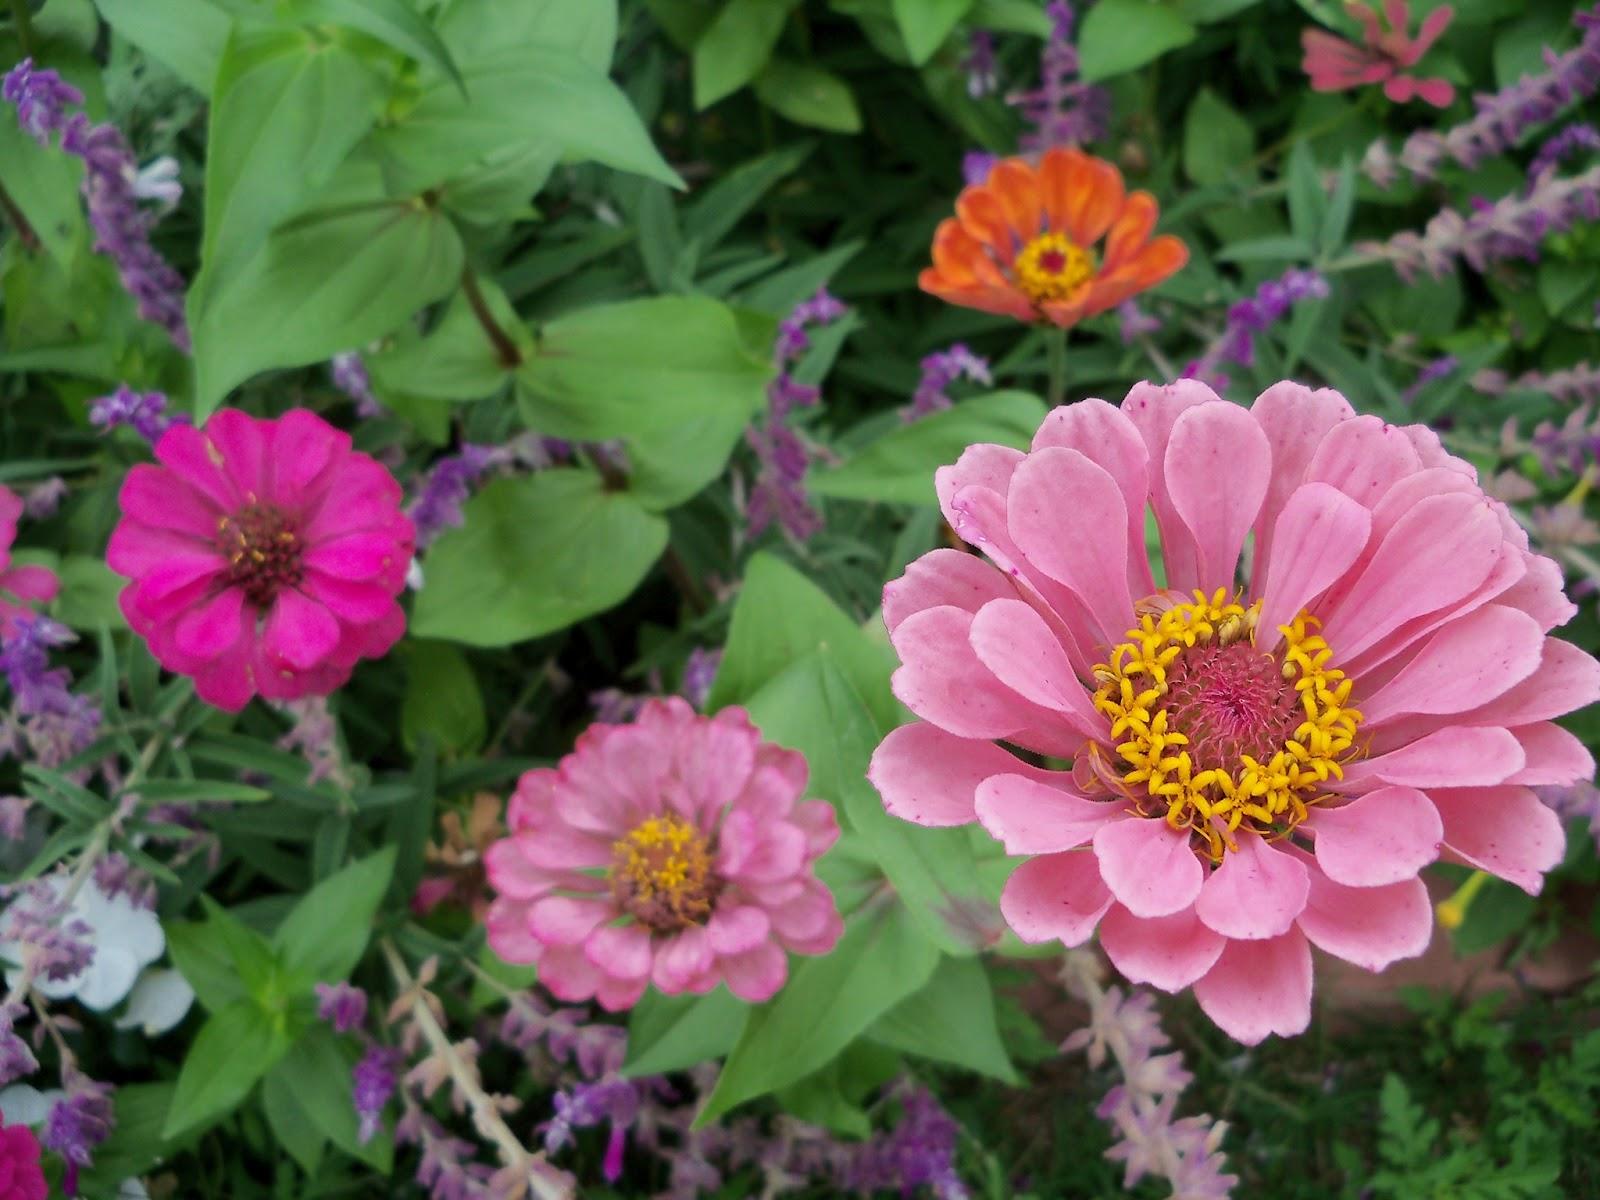 Gardening 2012 - 115_1989.JPG